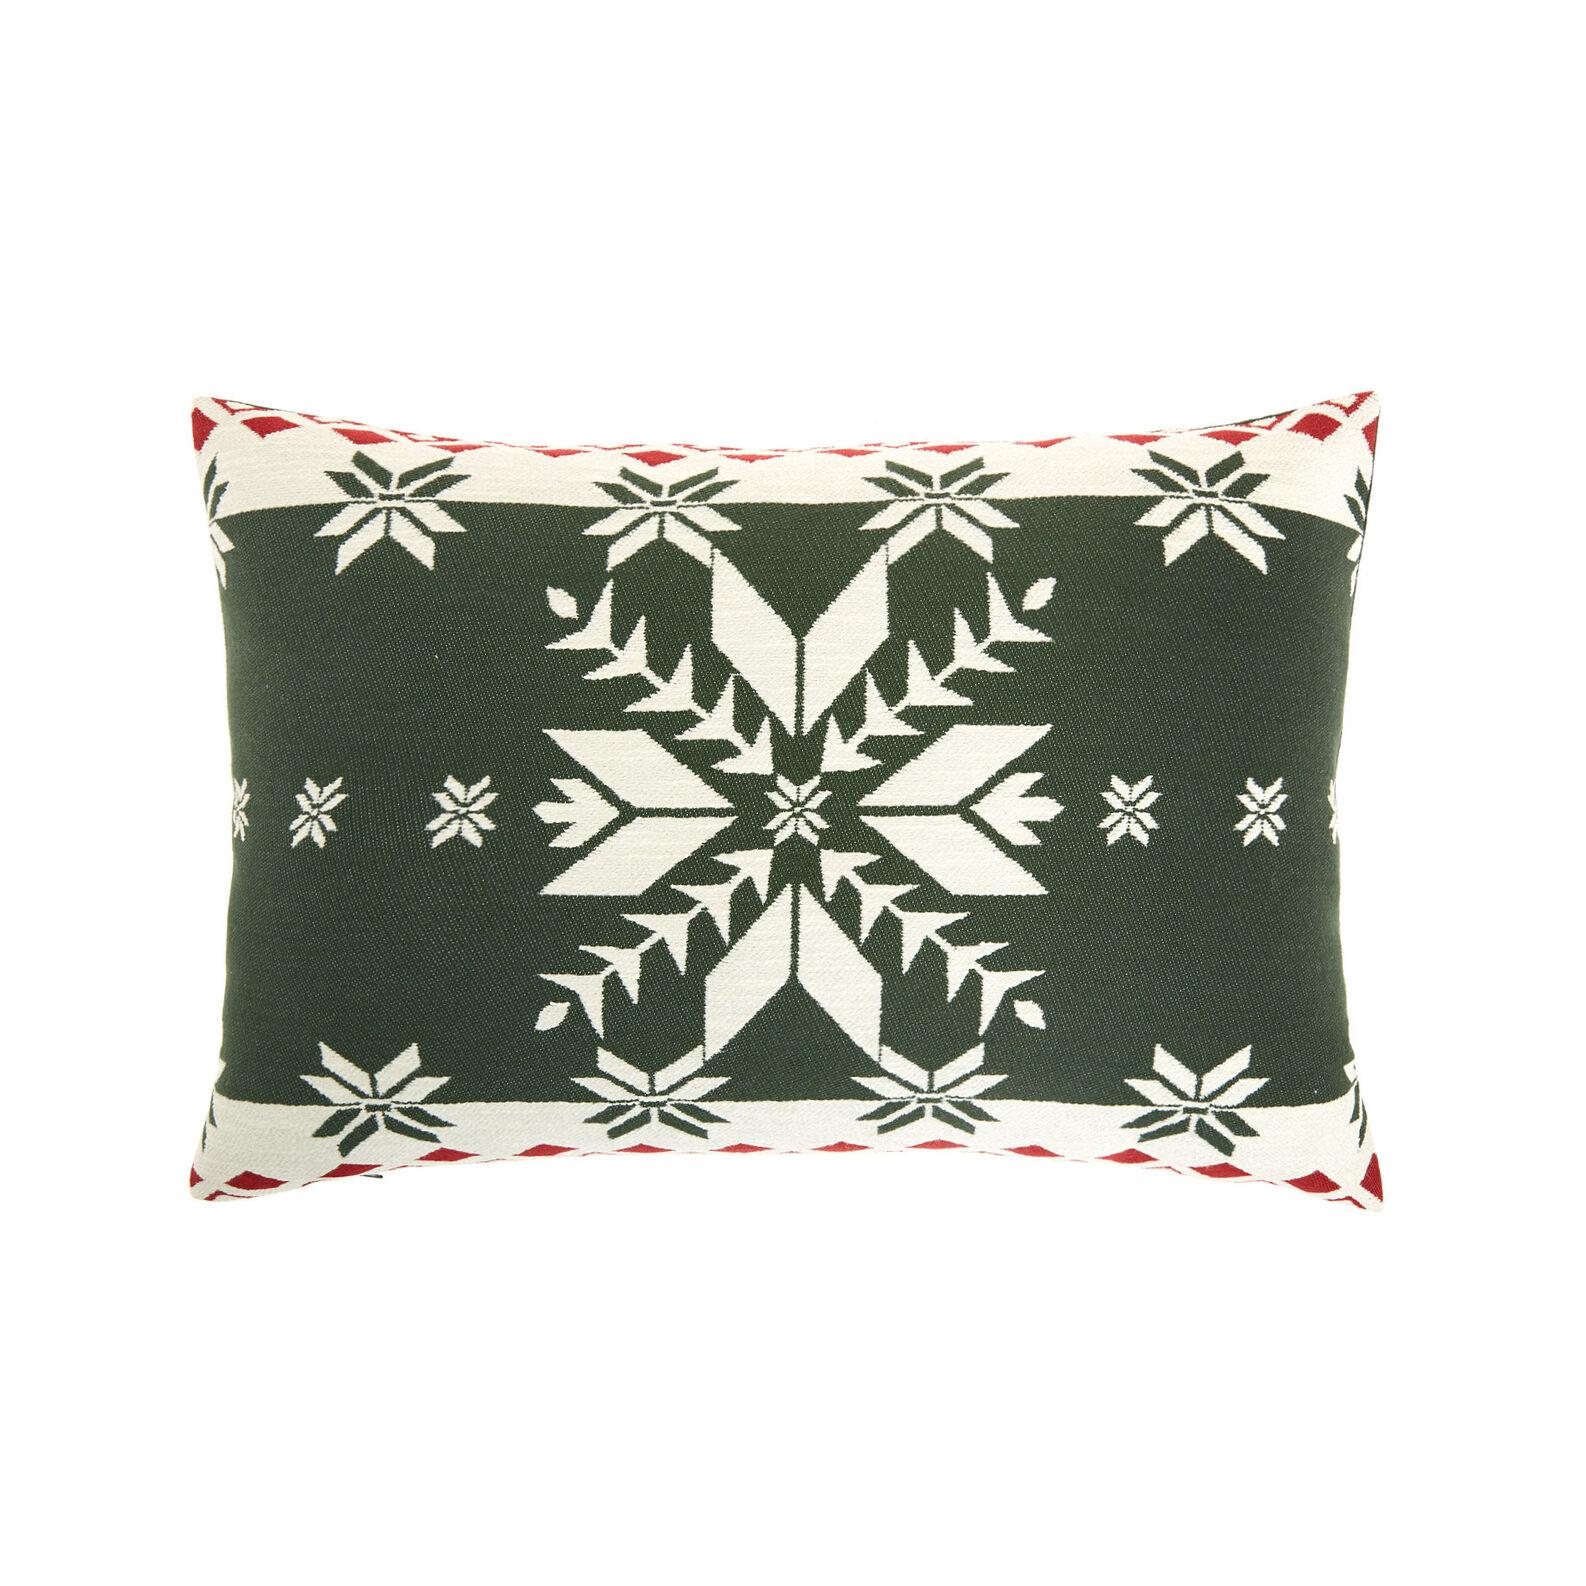 Jacquard cushion with Christmas motif 35x55cm